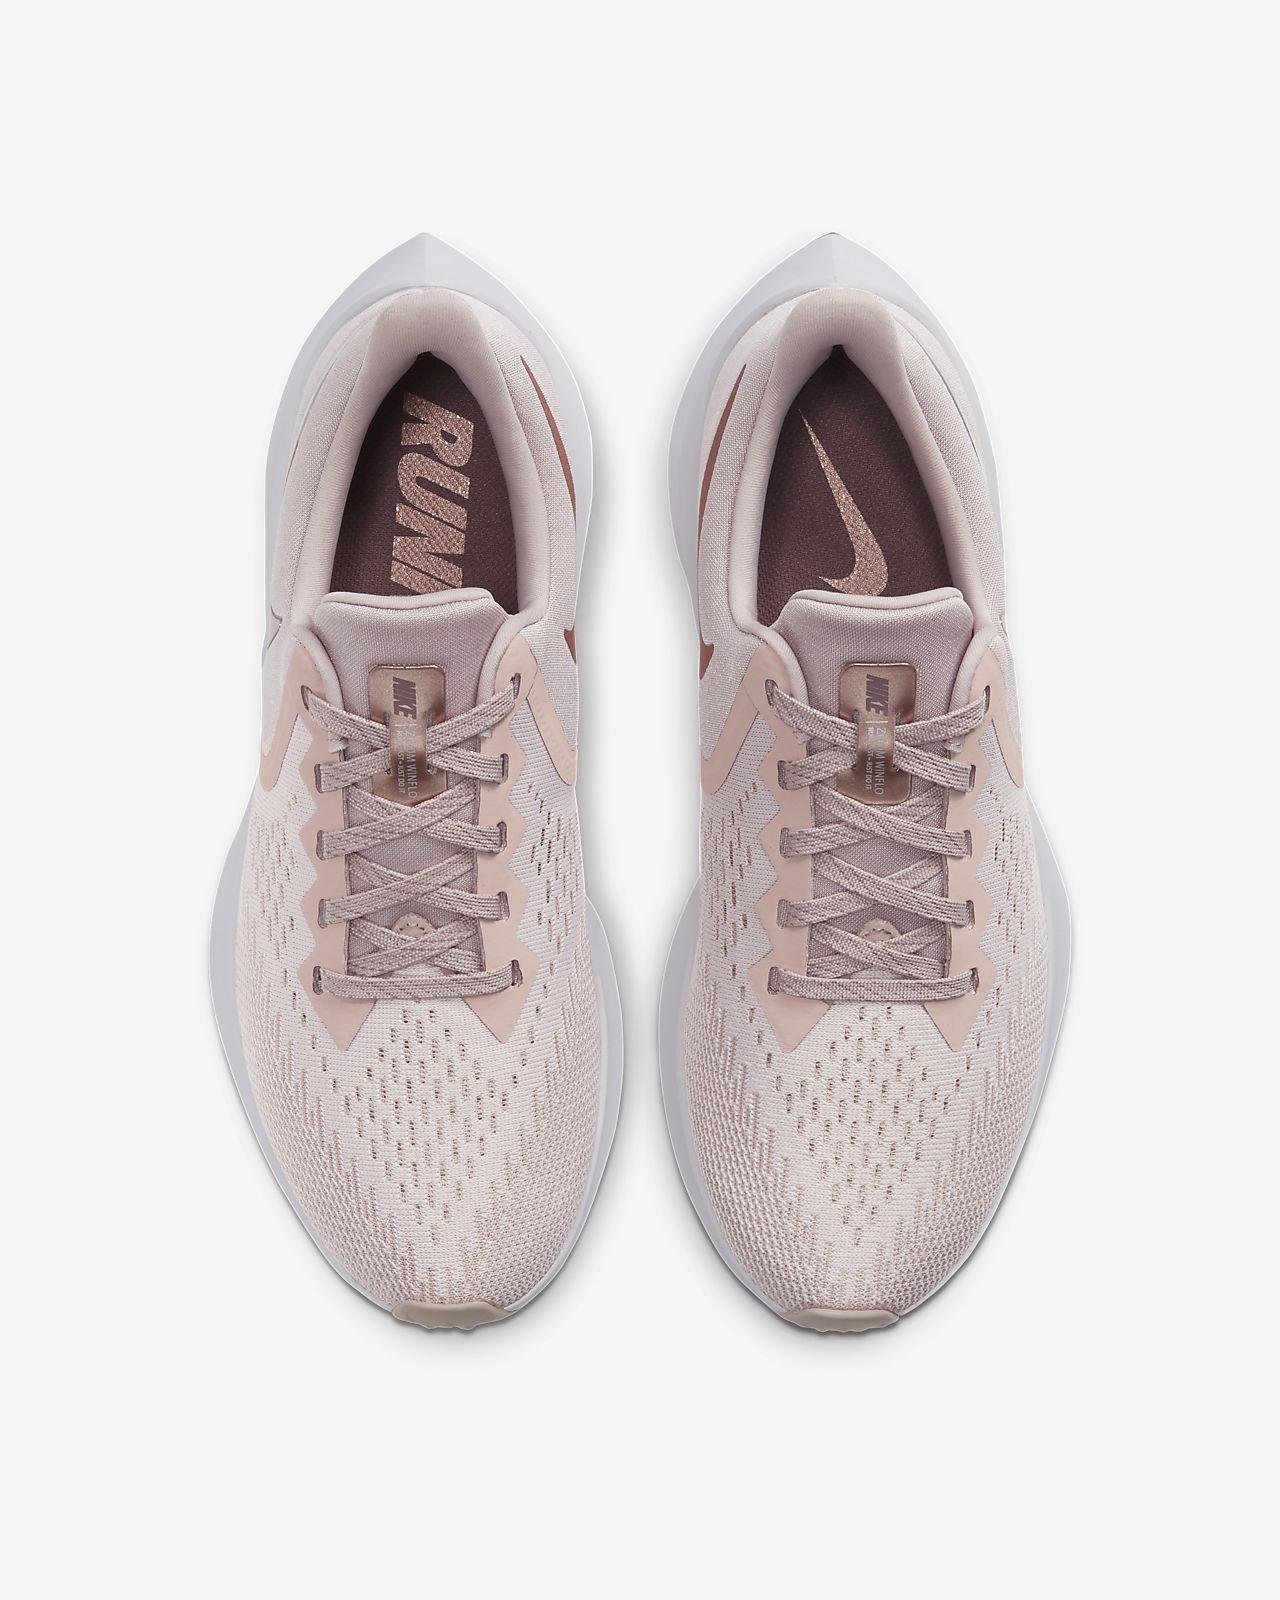 Calzado de running para mujer Nike Air Zoom Winflo 6